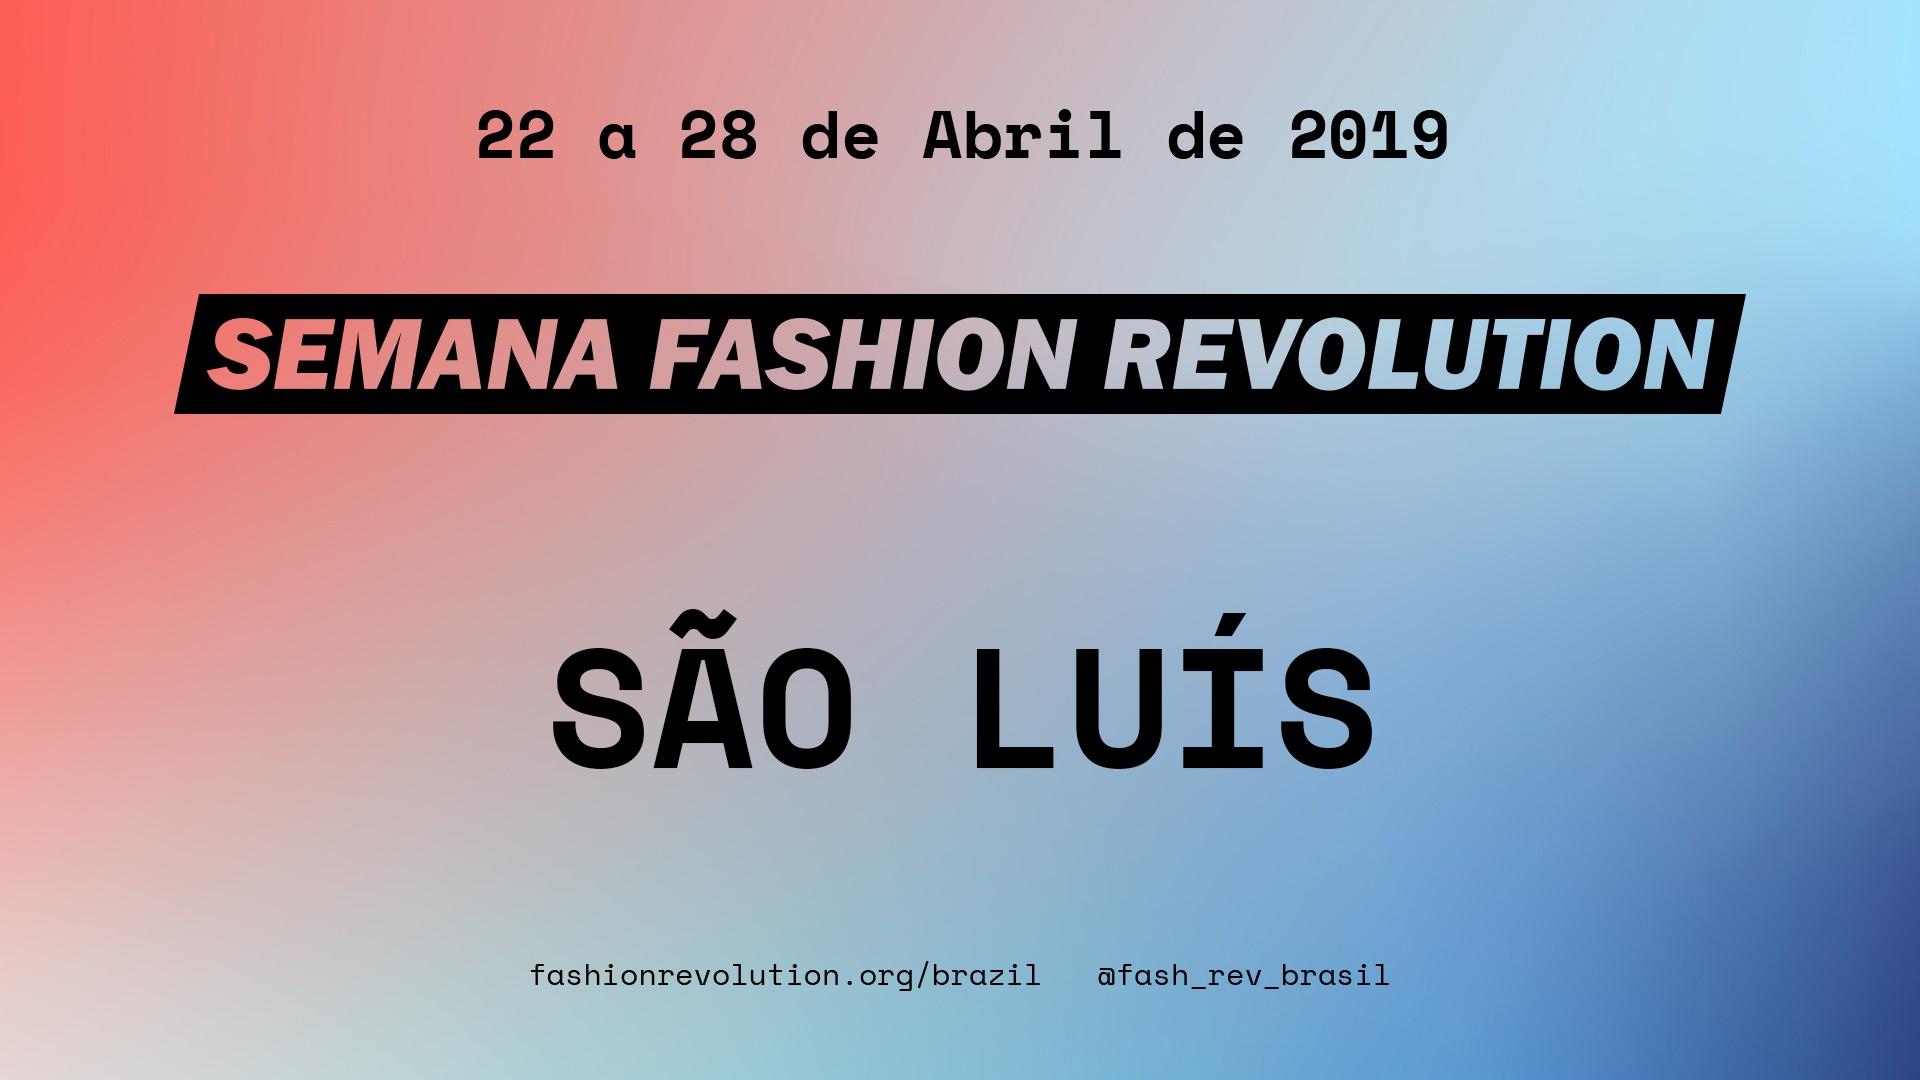 Fashion Revolution São Luís